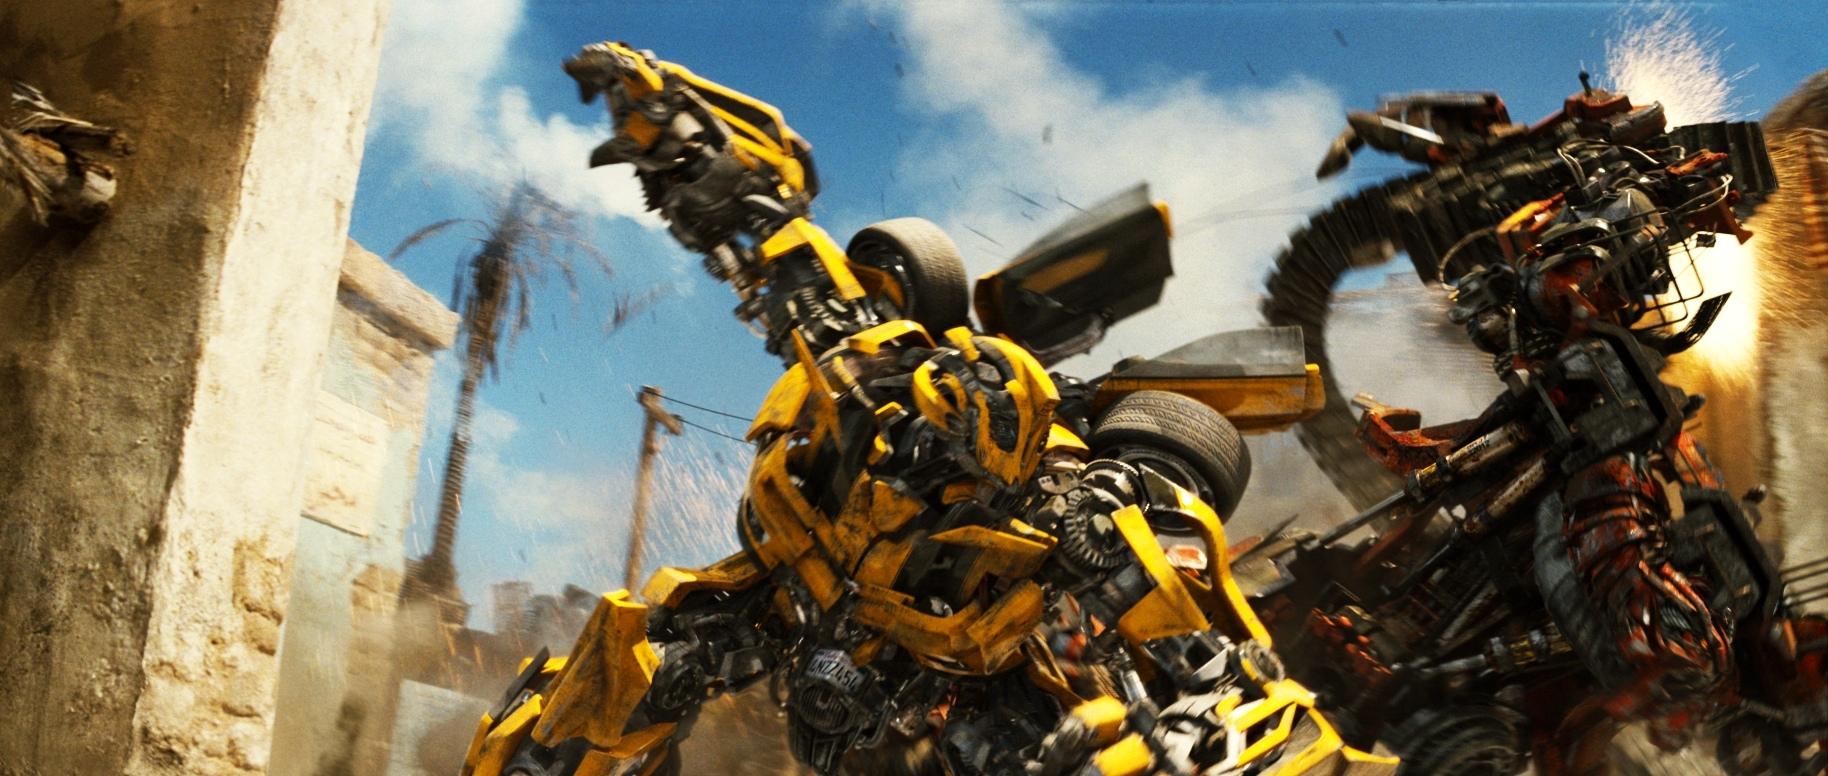 Transformers The Dark of the Moon / Трансформеры 3. В комнате